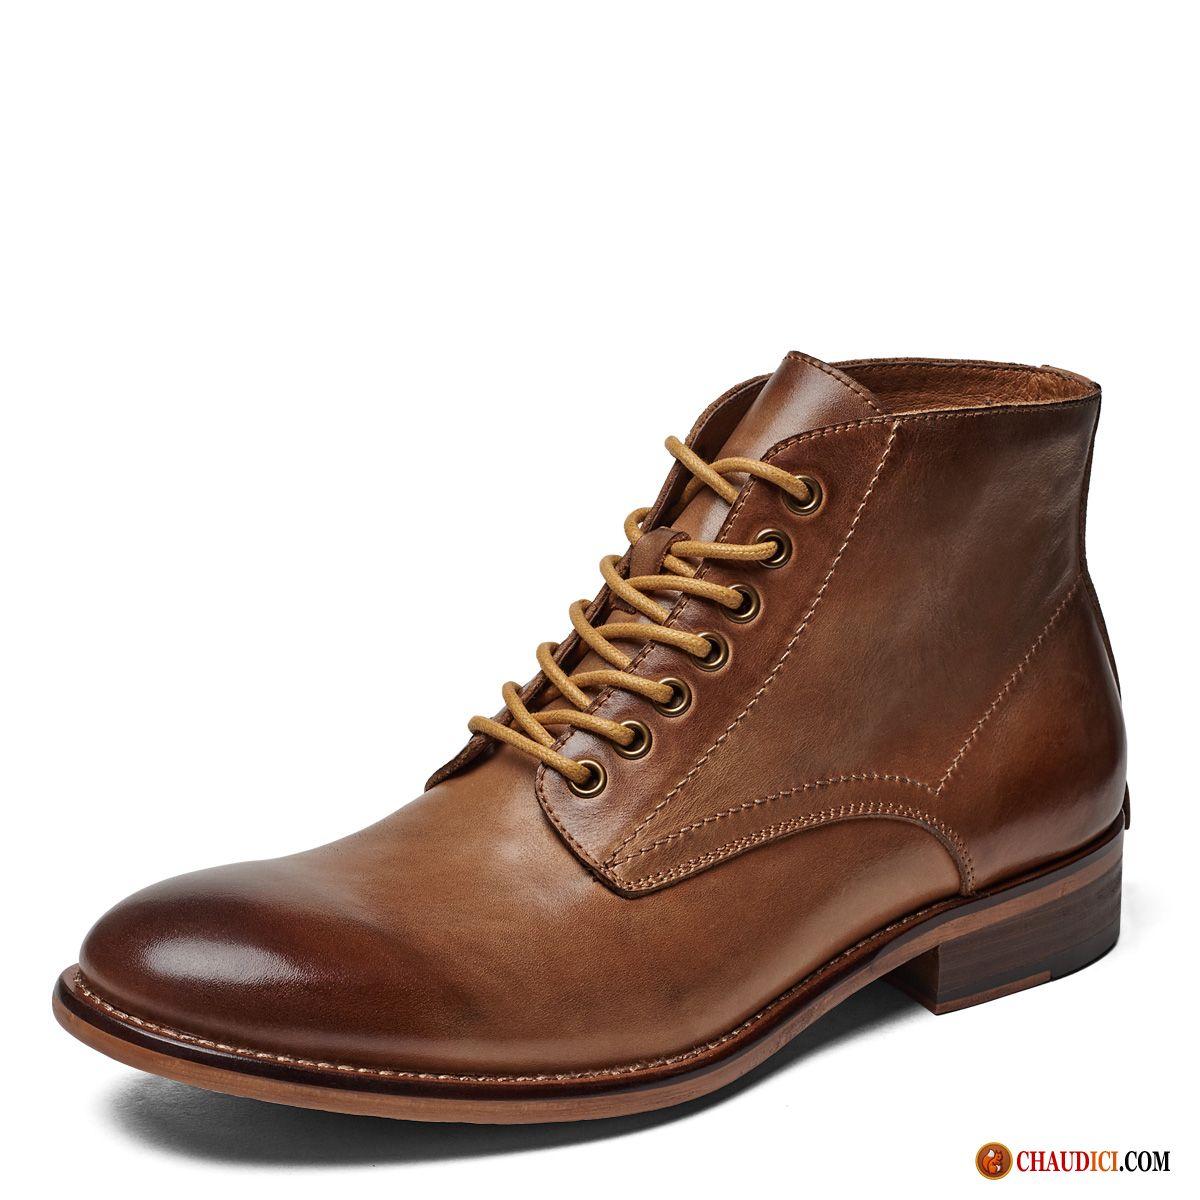 a7dfa6818d9 Chaussures Boots Hommes Soldes Rose Bottes Angleterre Homme Mode Rétro